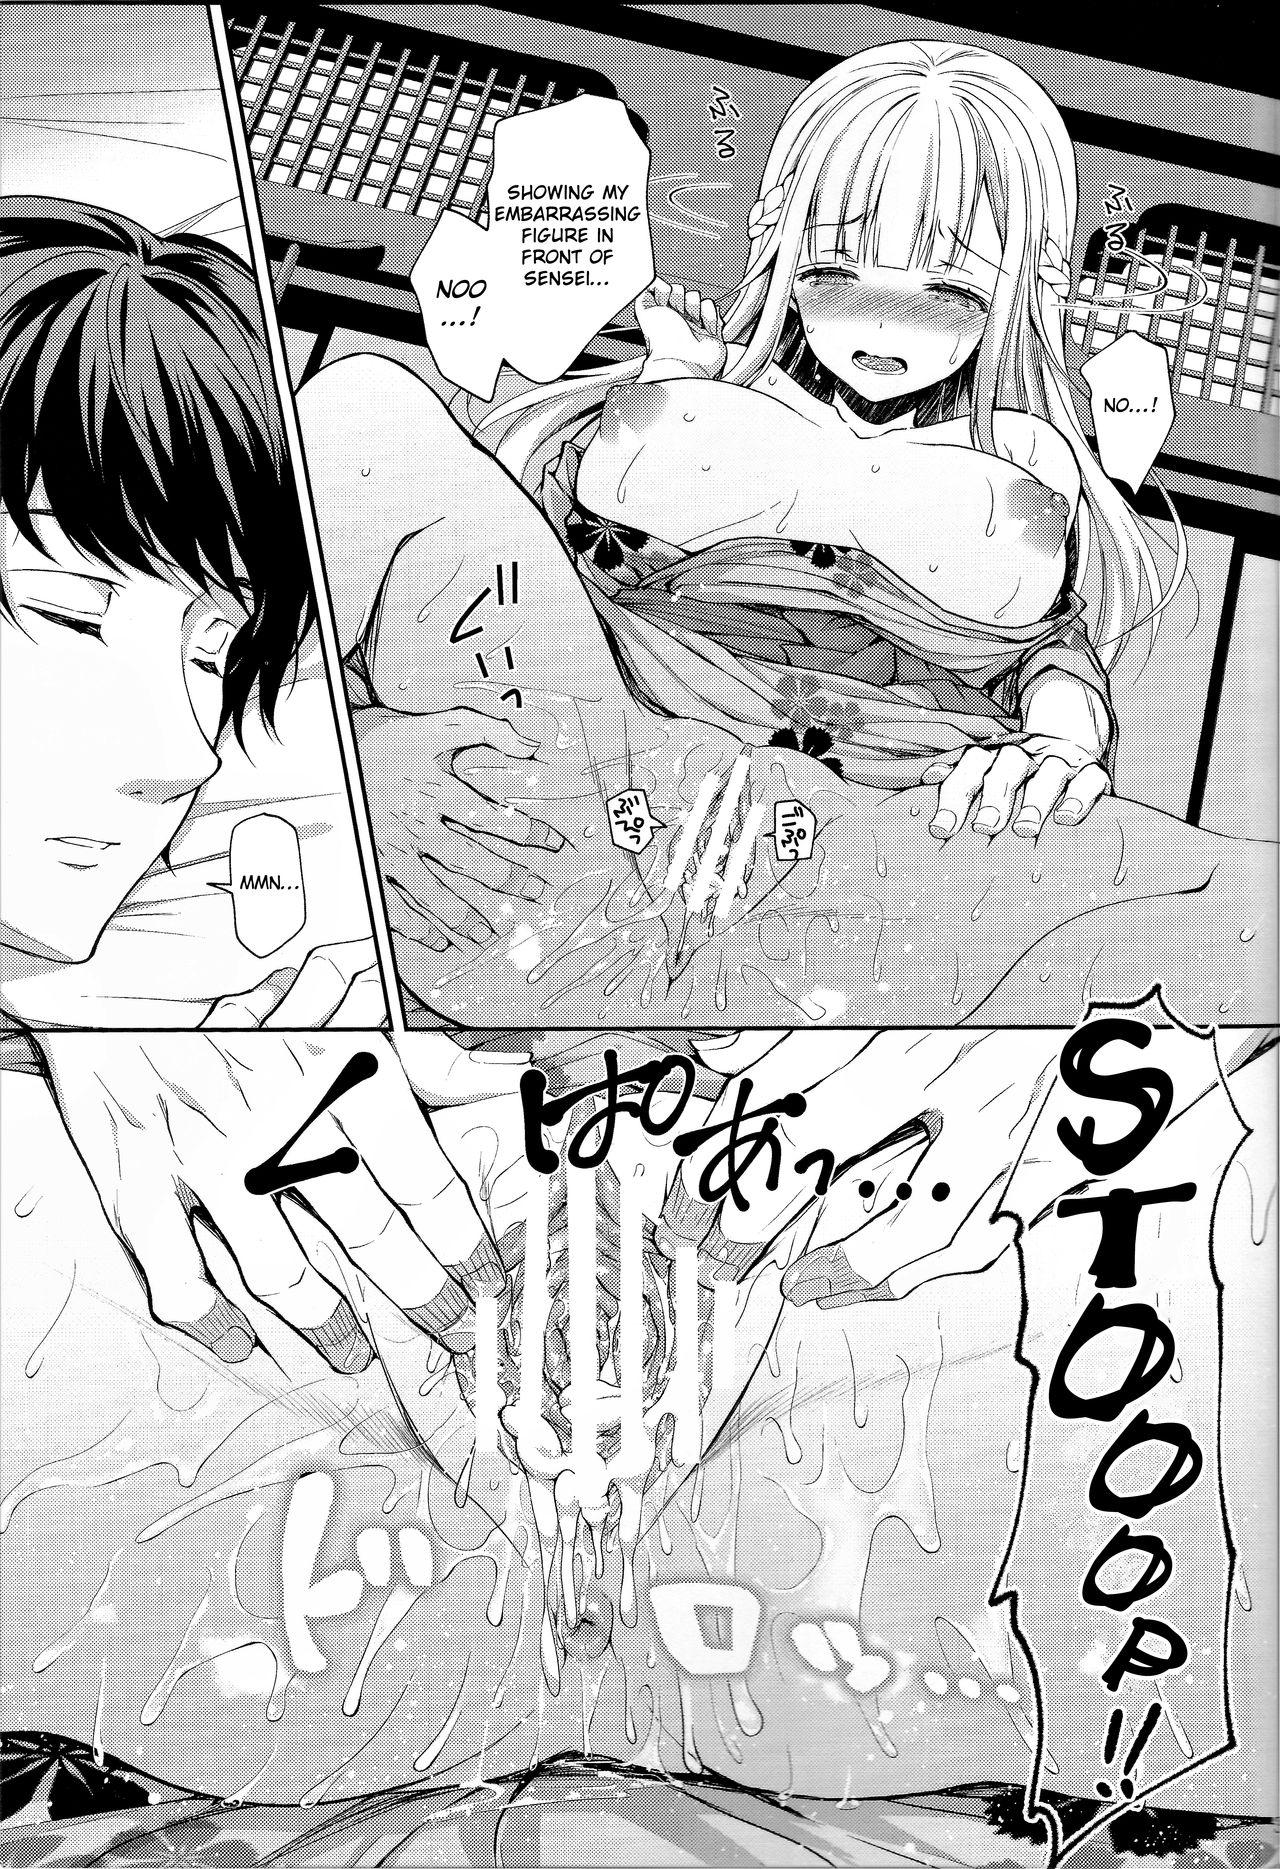 (C97) [Sugar*Berry*Syrup (Crowe)] Indeki no Reijou 4 ~Kare no Tonari de Nureru Insei~   Obscene Lady 4 ~Wet and Moaning Beside My Boyfriend~  [English] [obsoletezero] 37